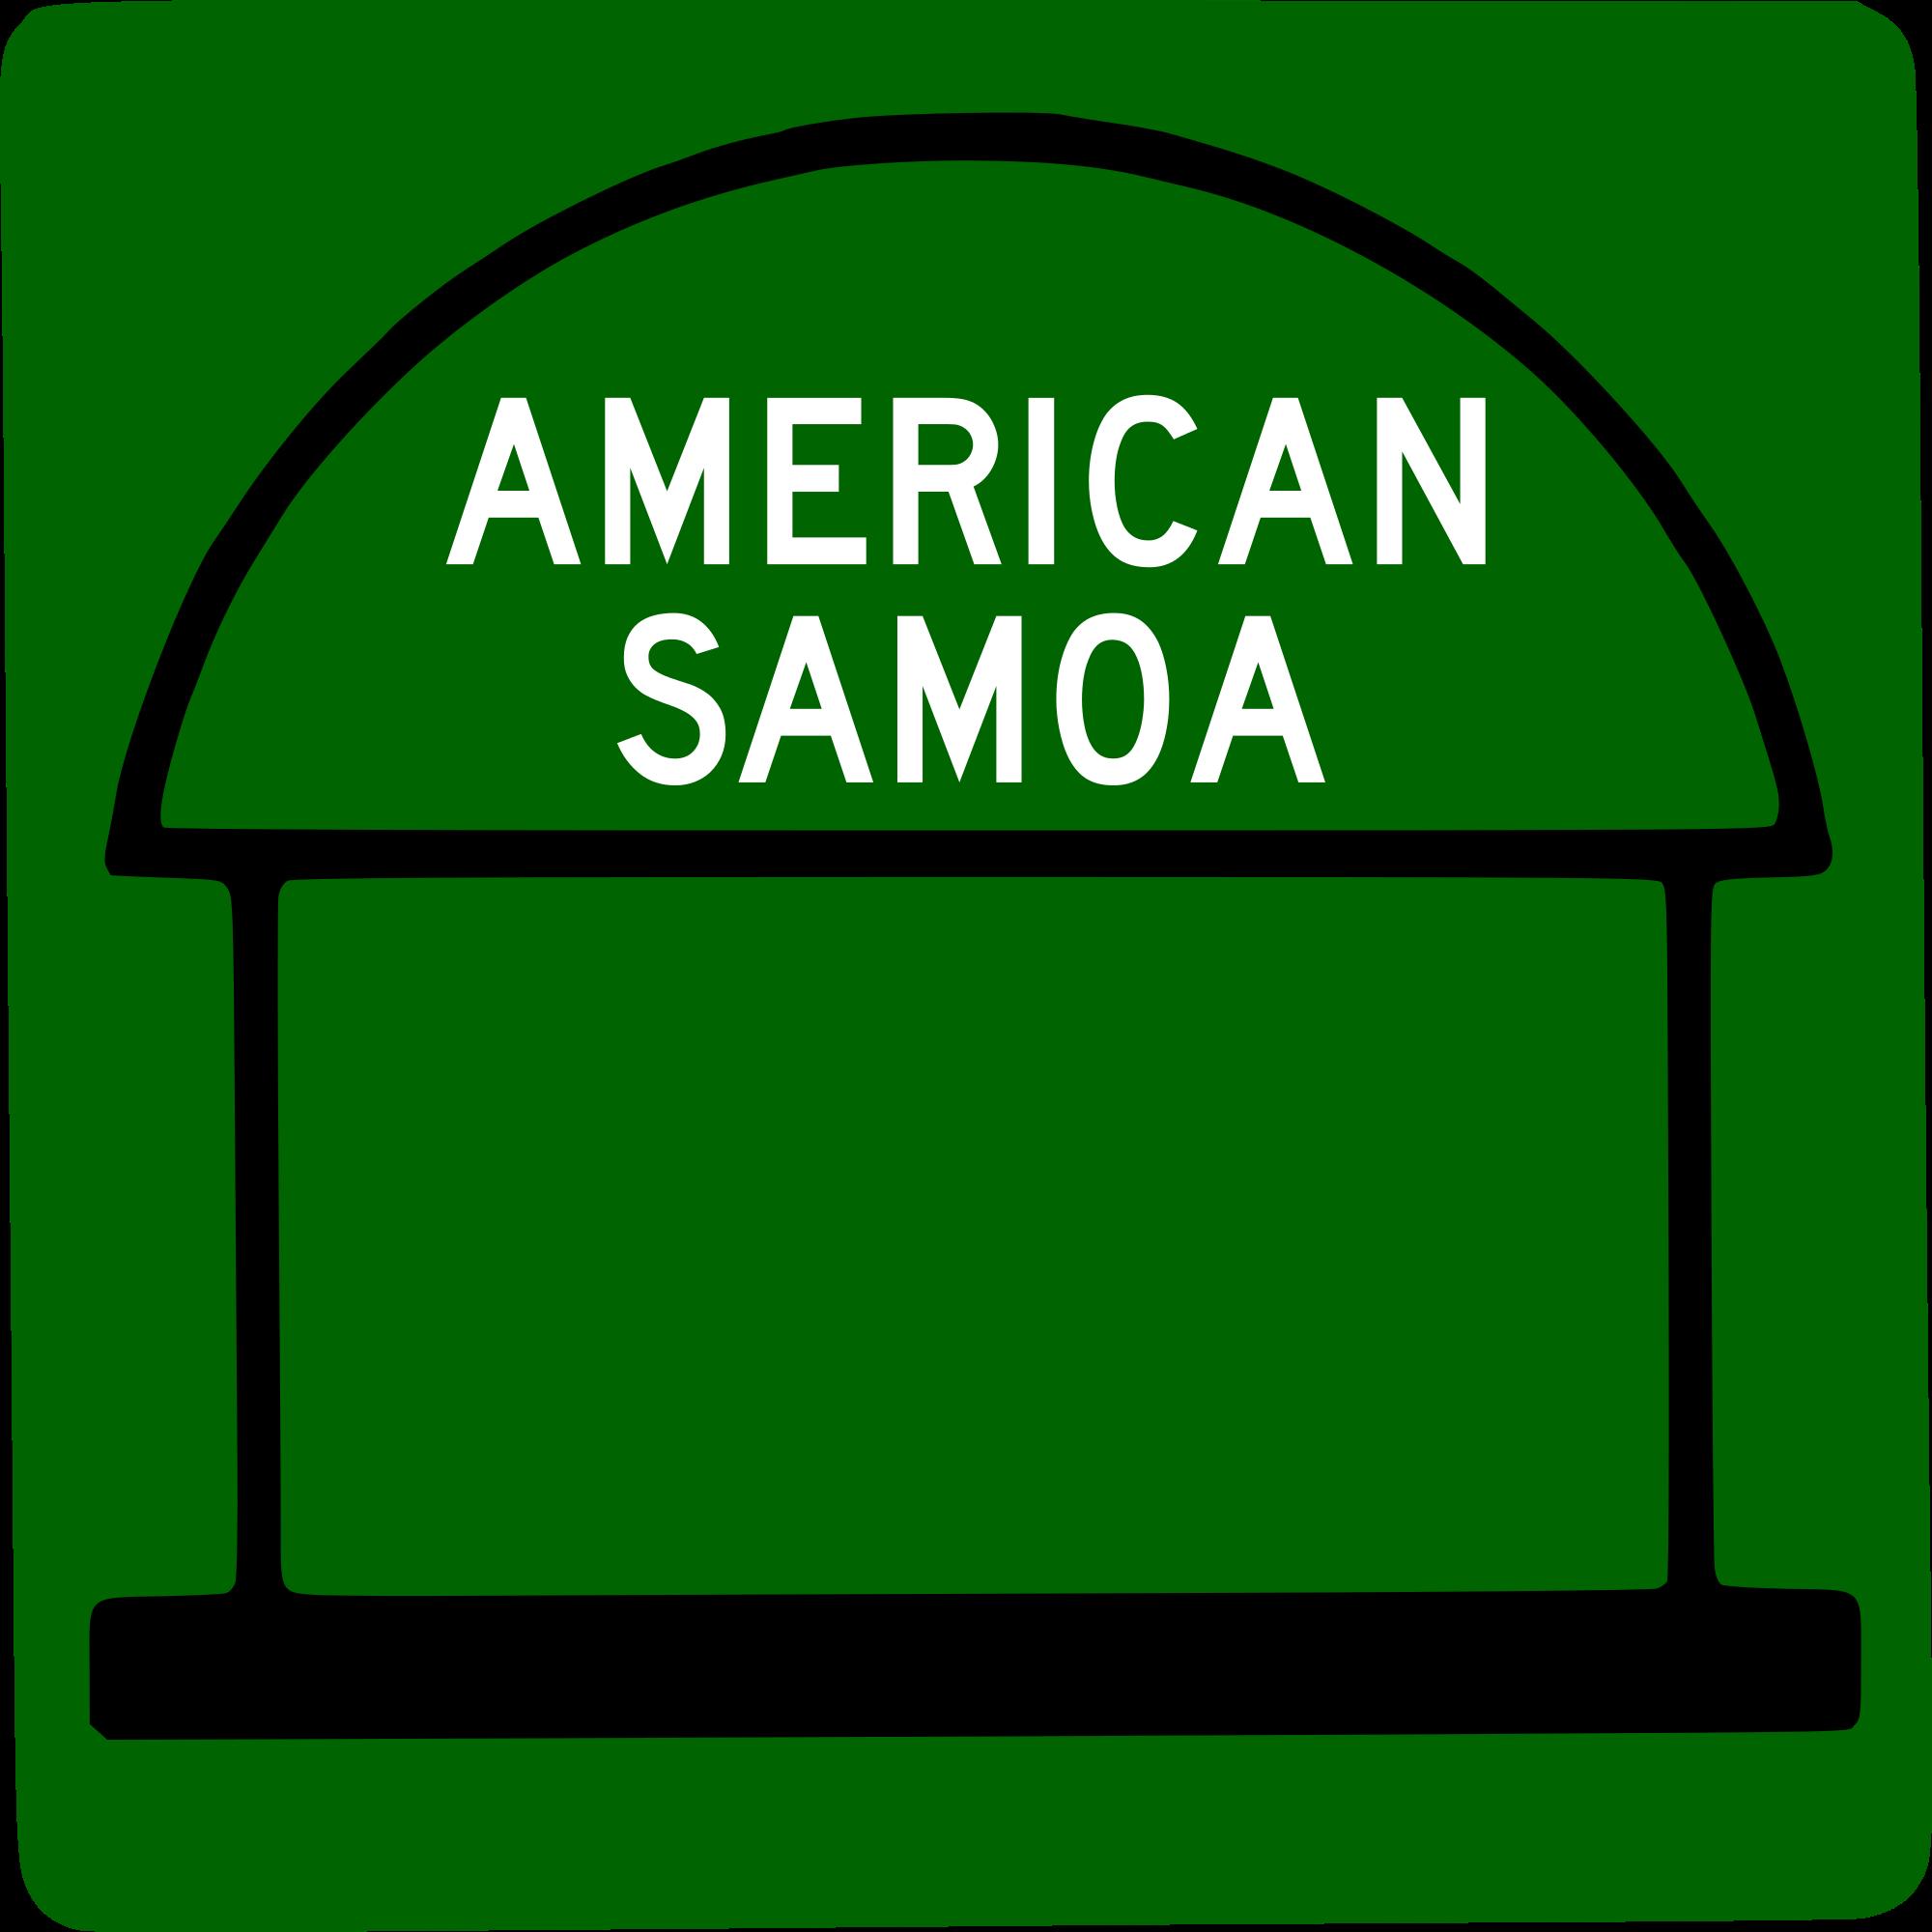 American Samoa svg #8, Download drawings